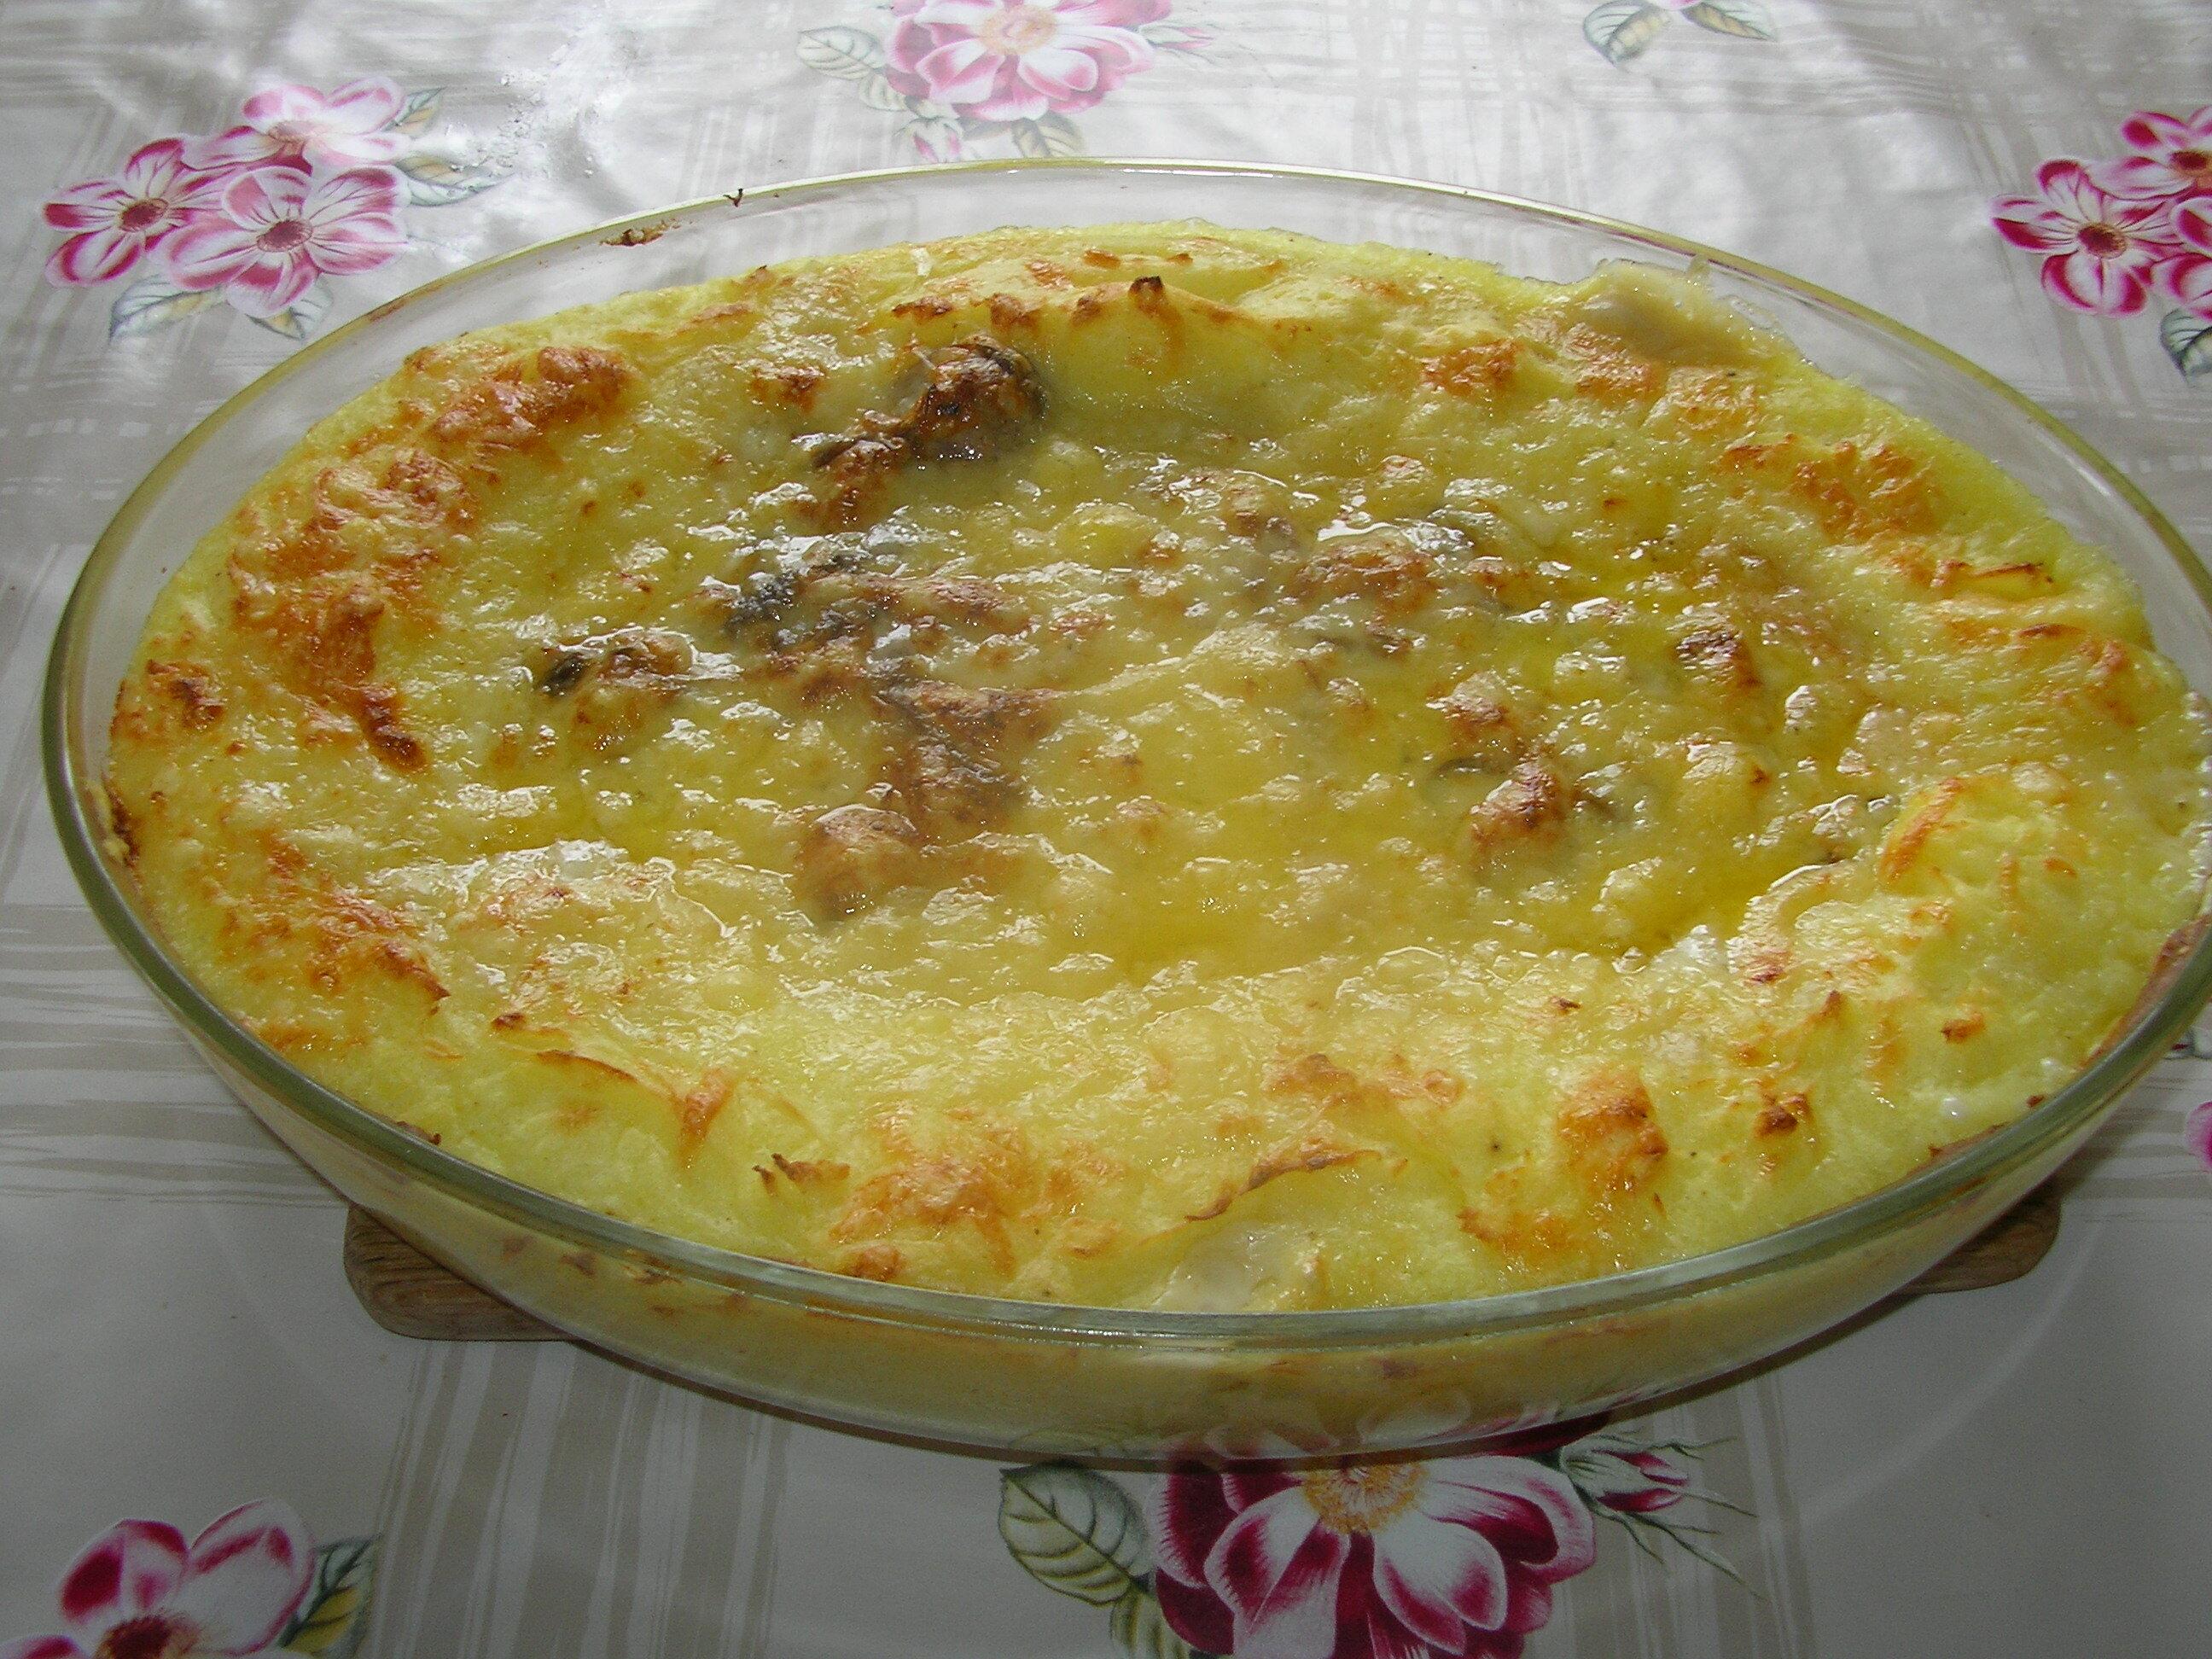 fläskfilé svampstuvning ugn